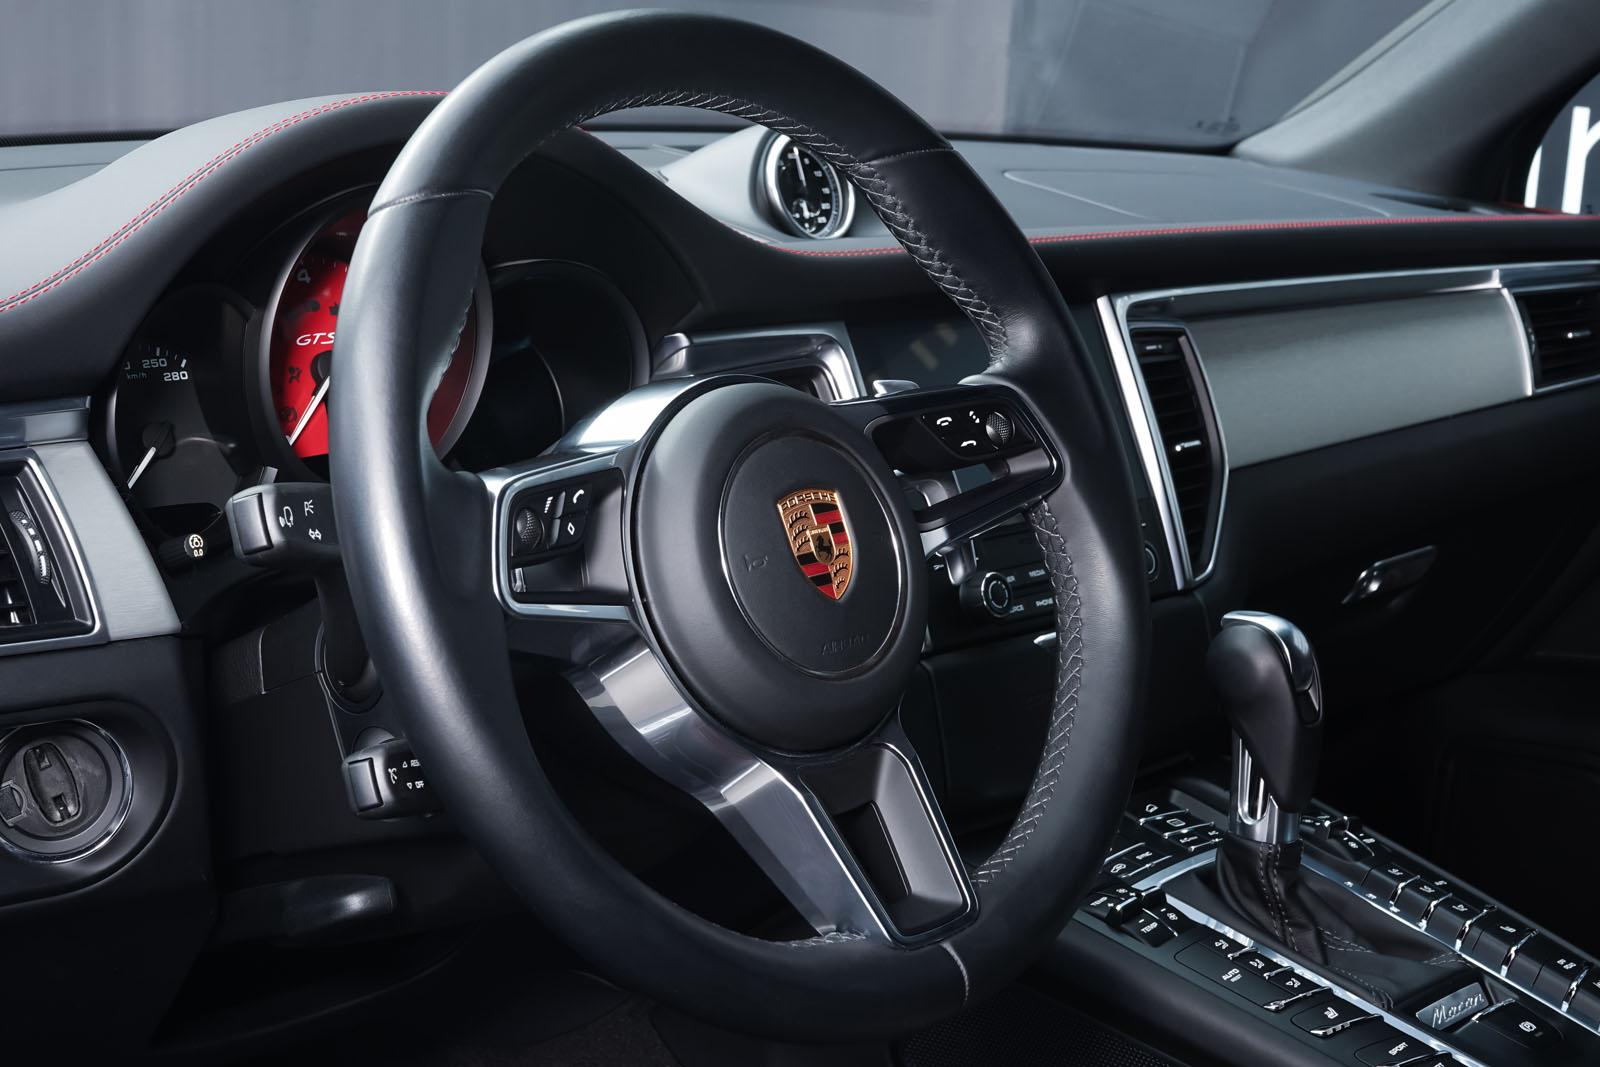 Porsche_Macan_GTS_Dunkelgrau_Schwarz_POR-8174_10_w